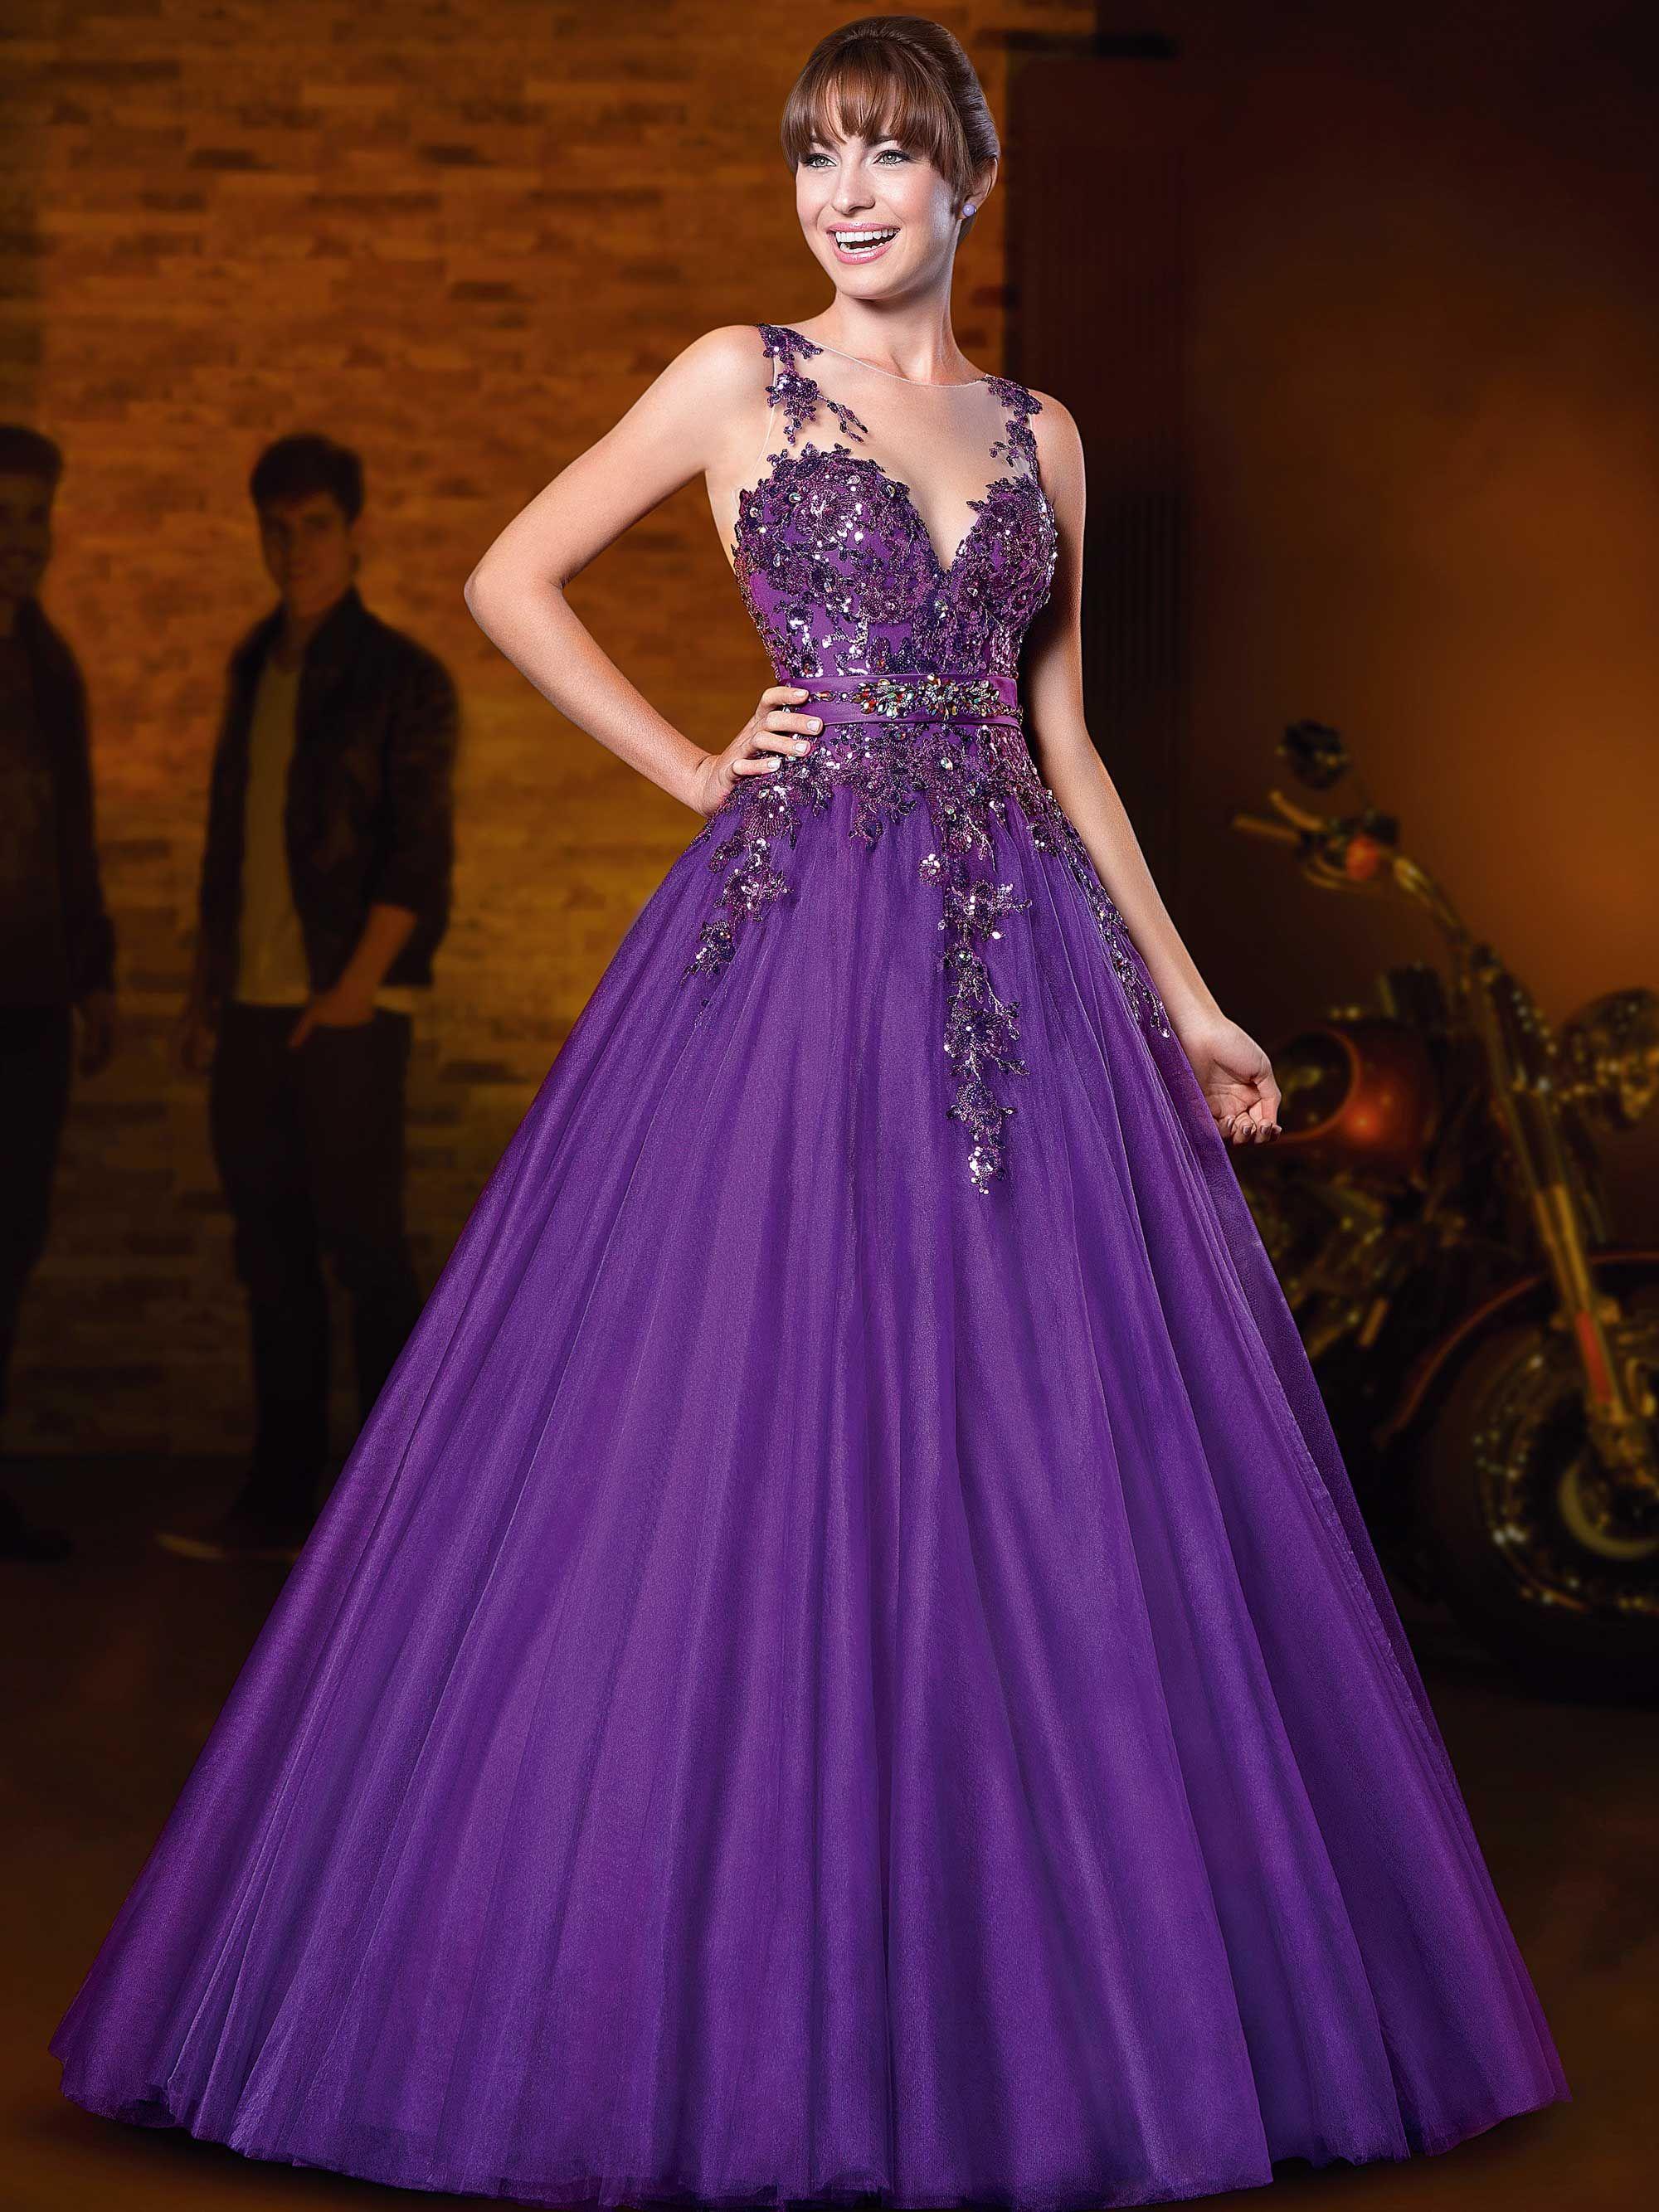 81e4cc5af Vestidos de 15 anos Festa Roxa, Vestido De Festa Roxo, Vestido Lilás,  Vestido